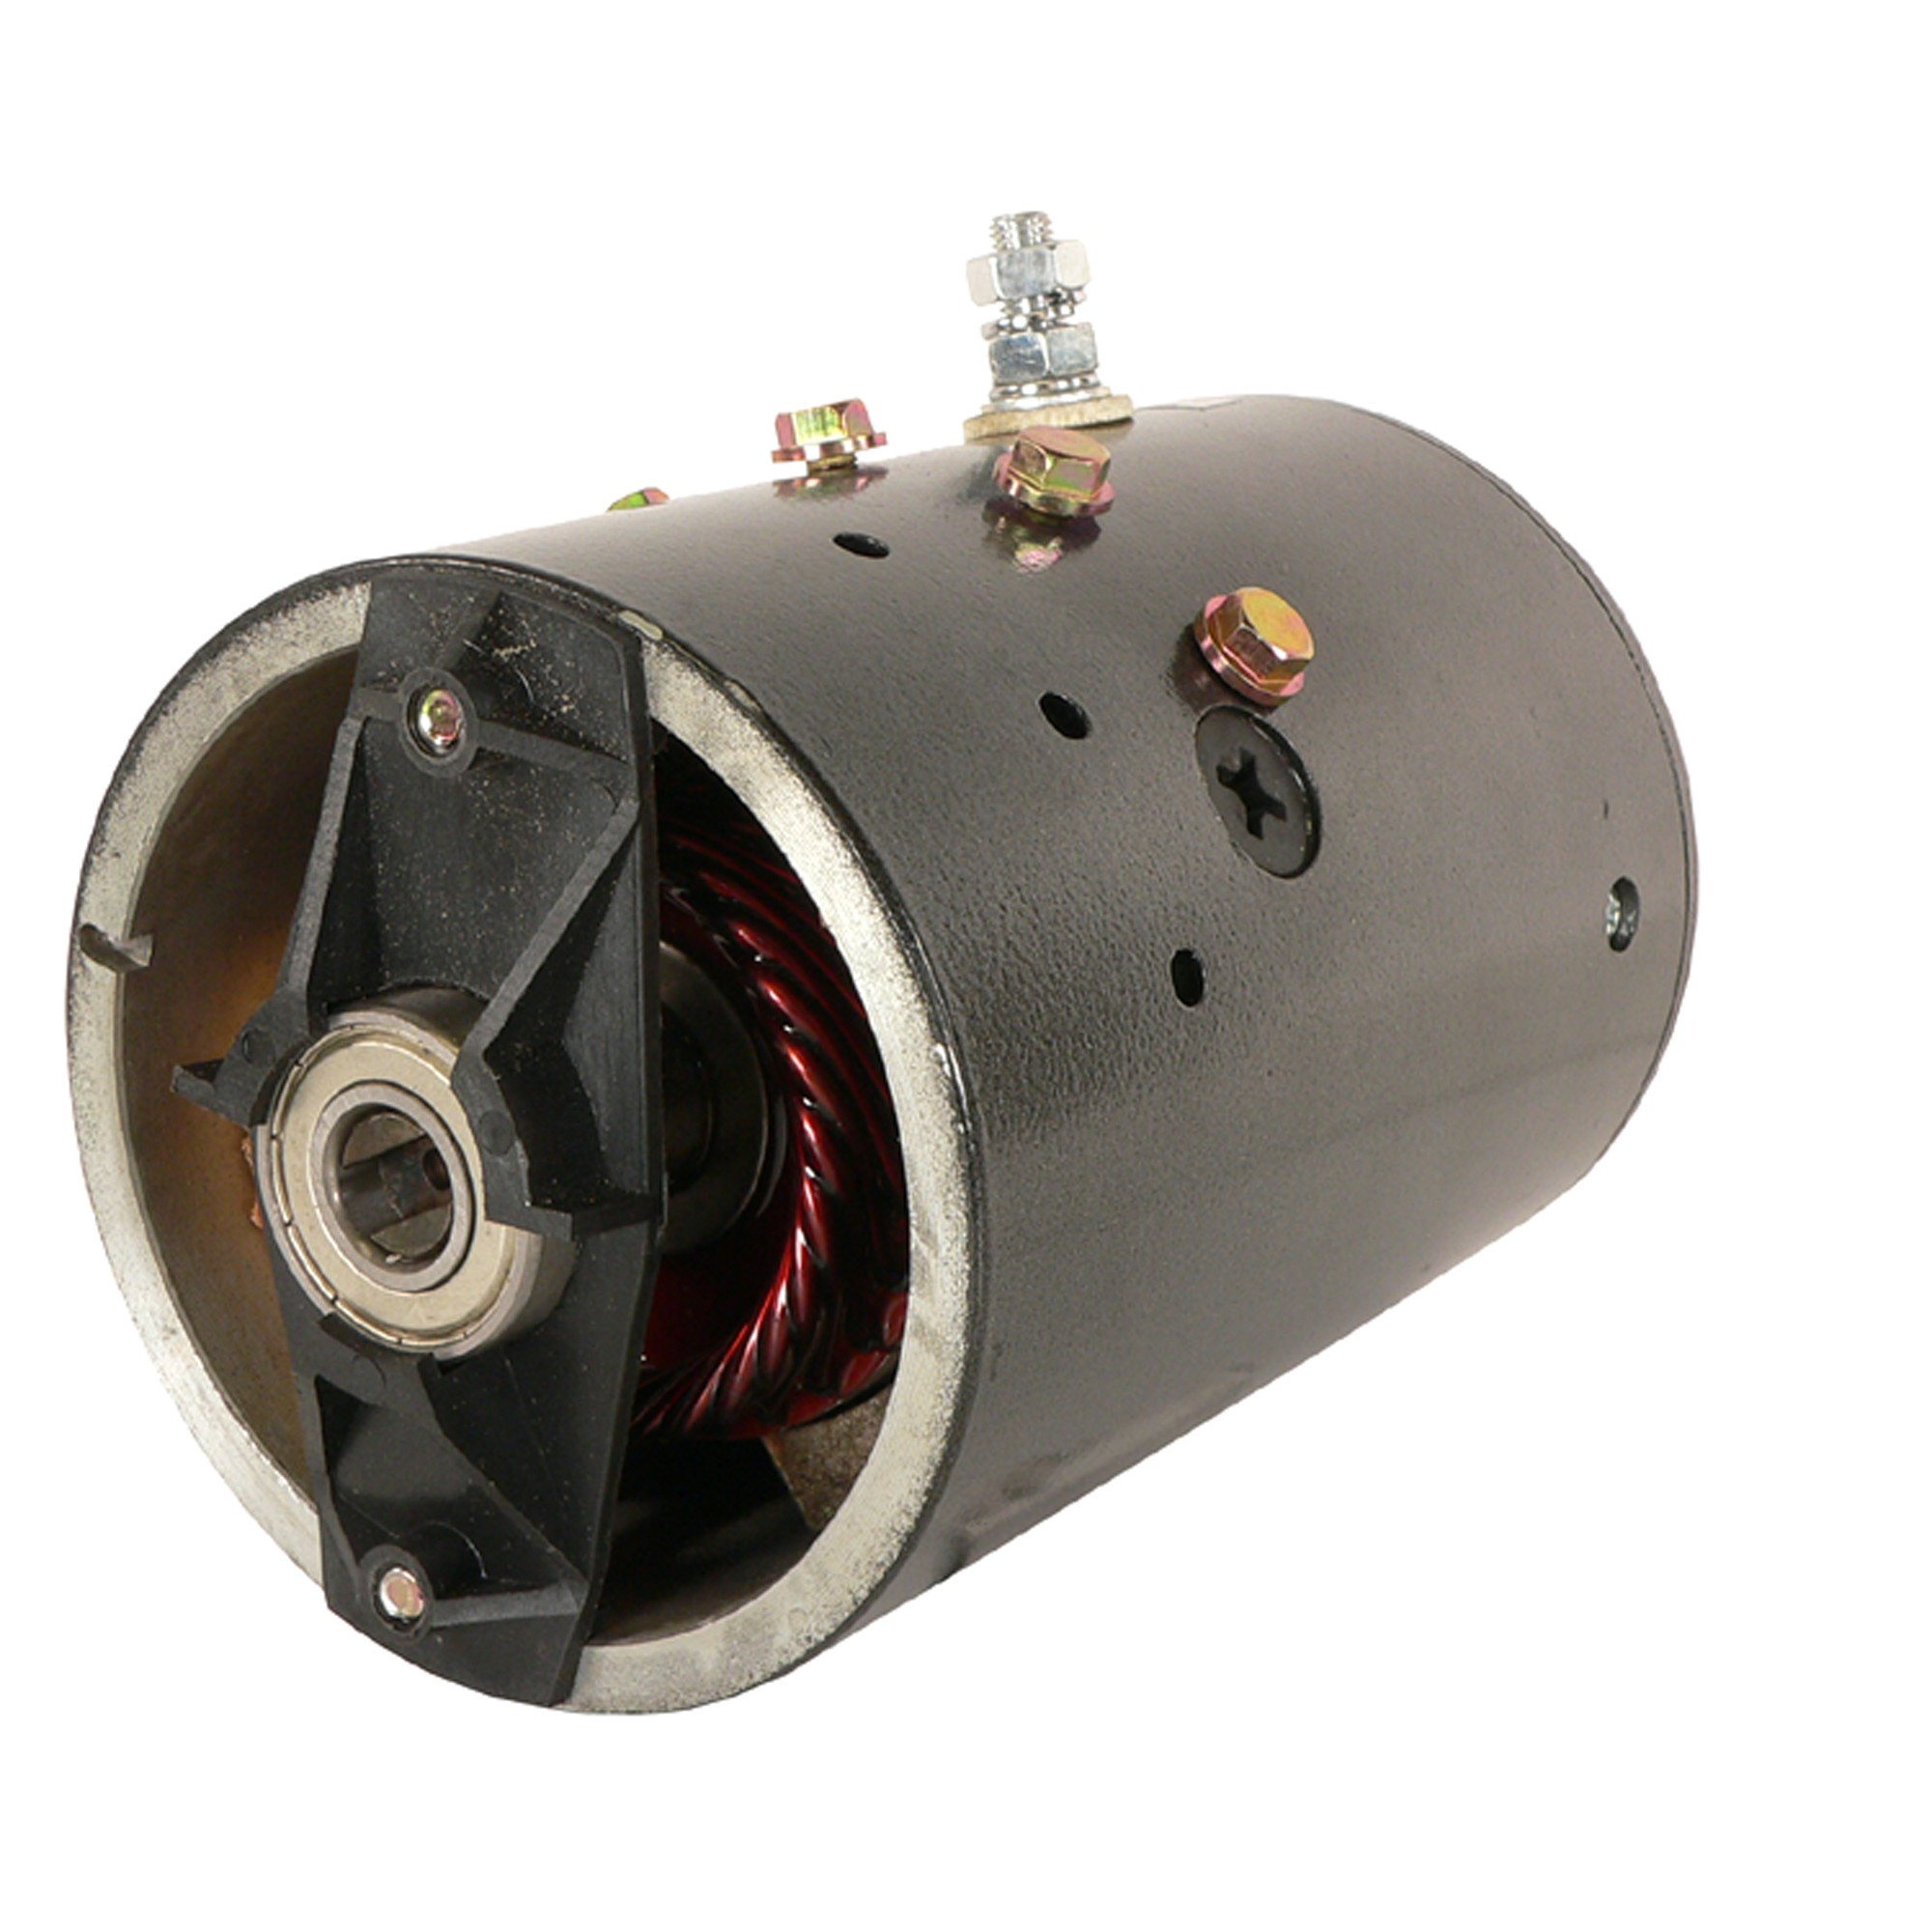 New Pump Motor Double-Ball Bearing Js Barnes Monarch Wapsa 10752 2200478